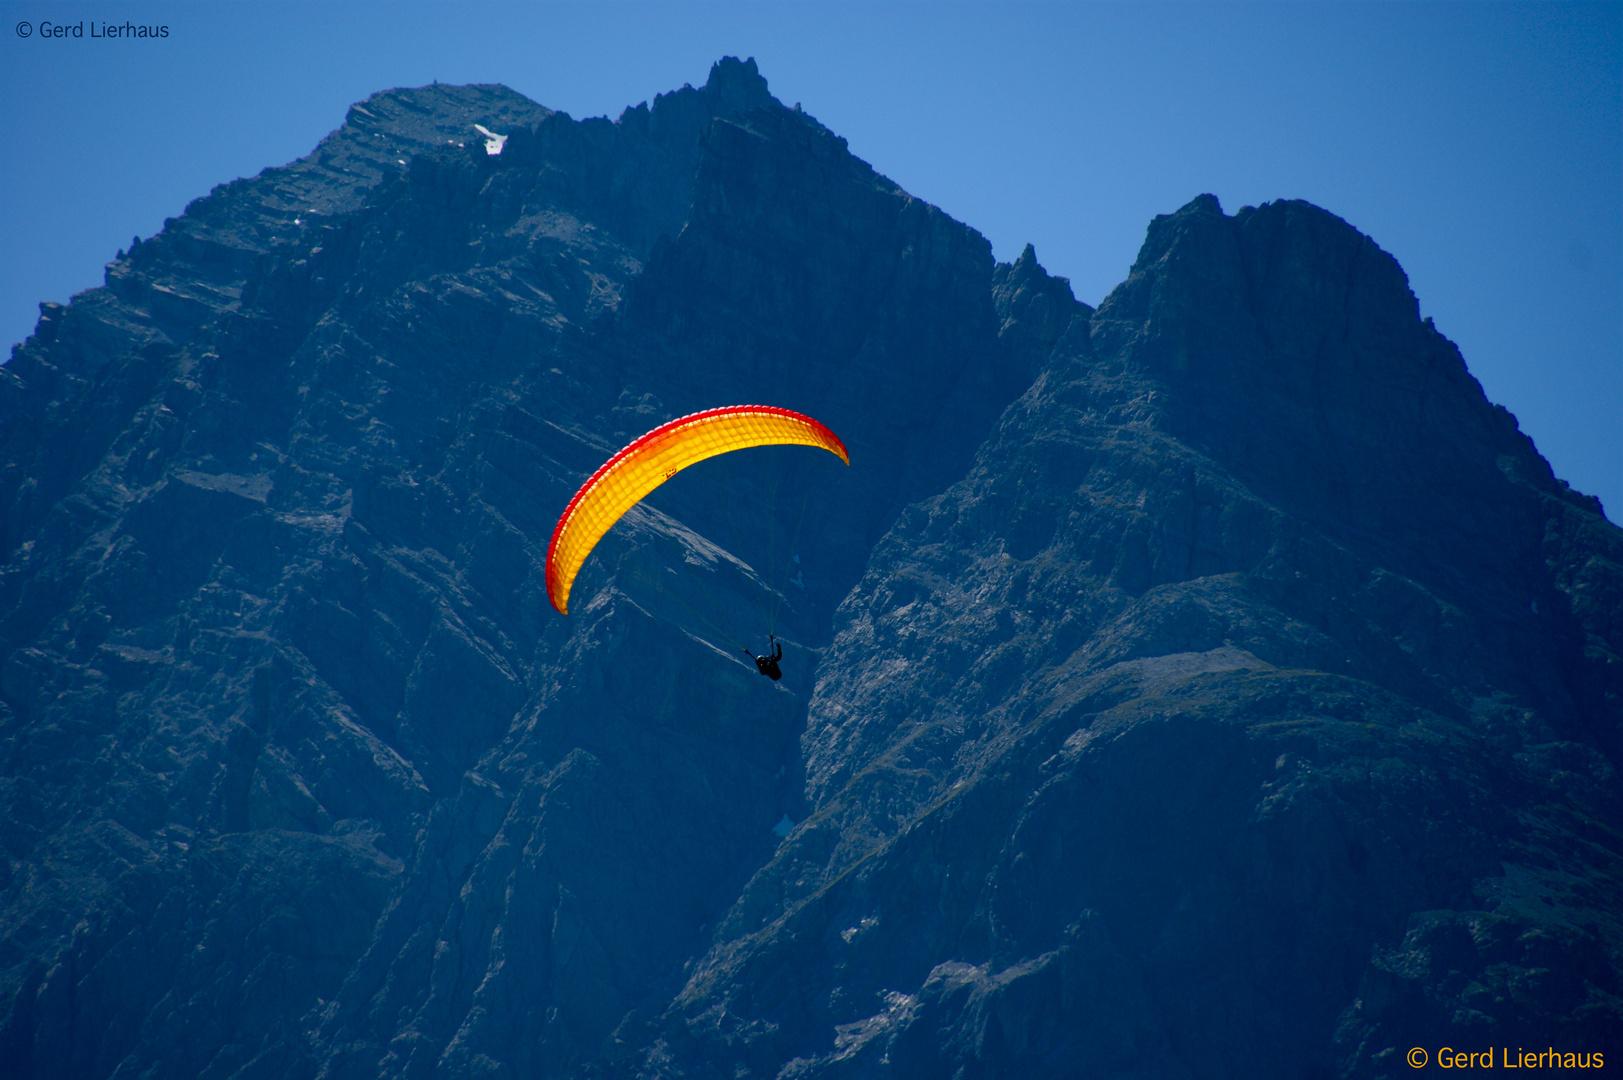 Gleitschirmflieger am Berg